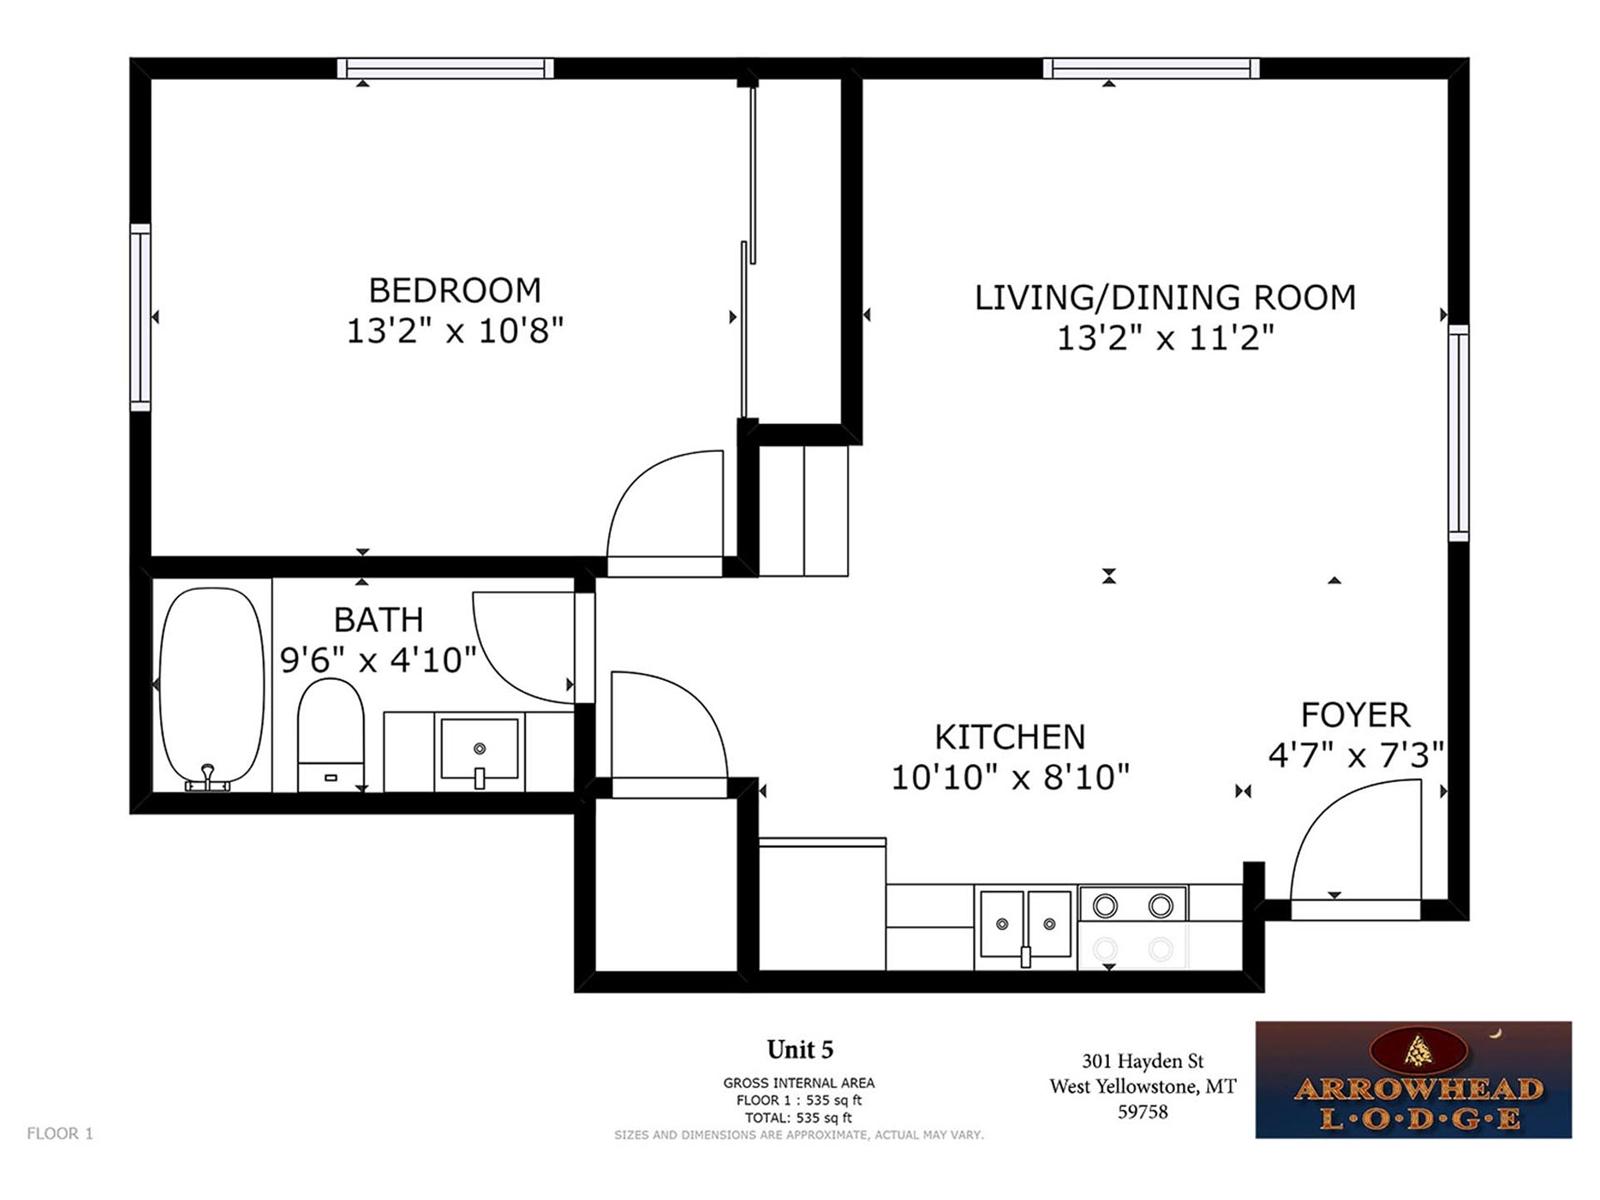 Floor Plan for Arrowhead Condos Unit 5